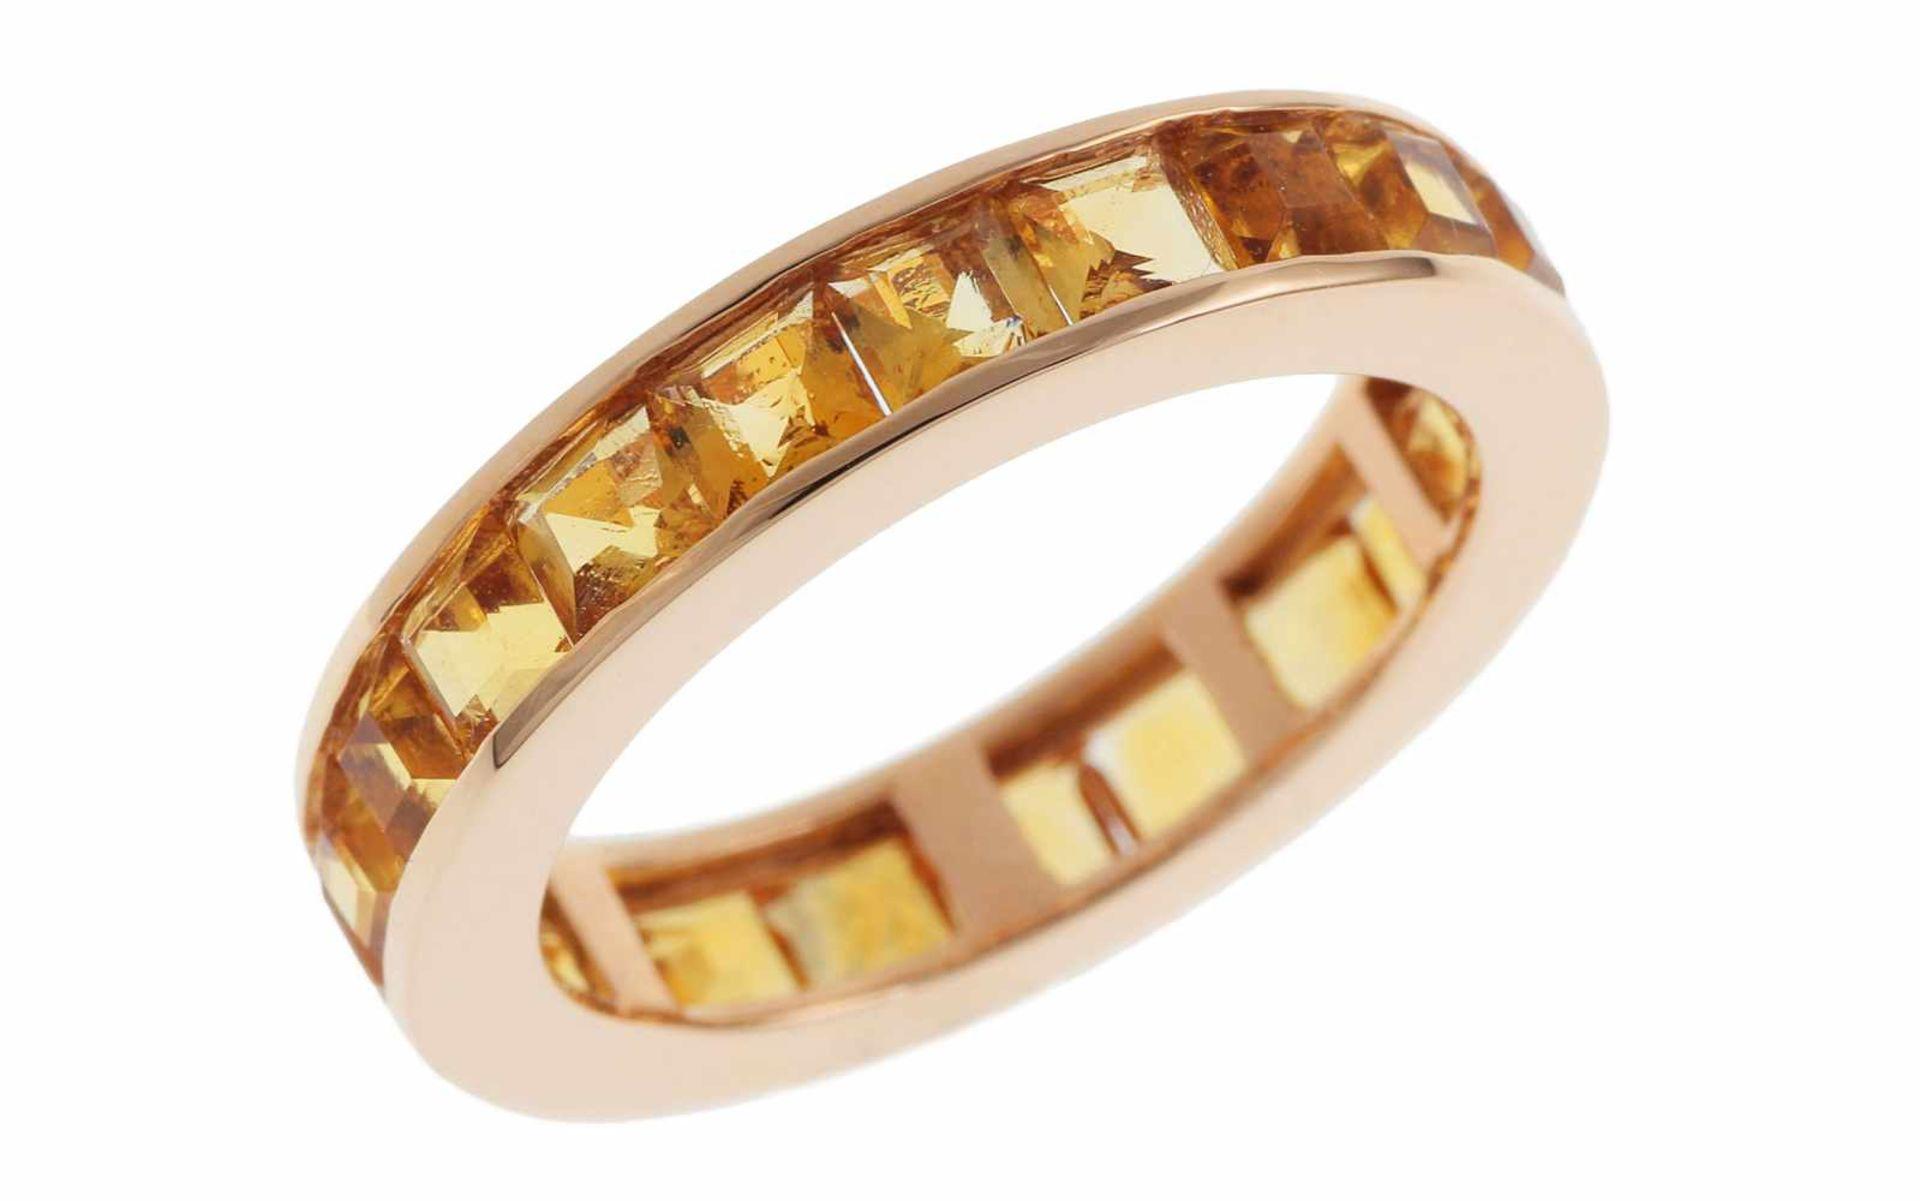 CitrinringMemoire Ring 18K RG mit 3,08 ct Citrinen RW: 54 Total 4,08 gr